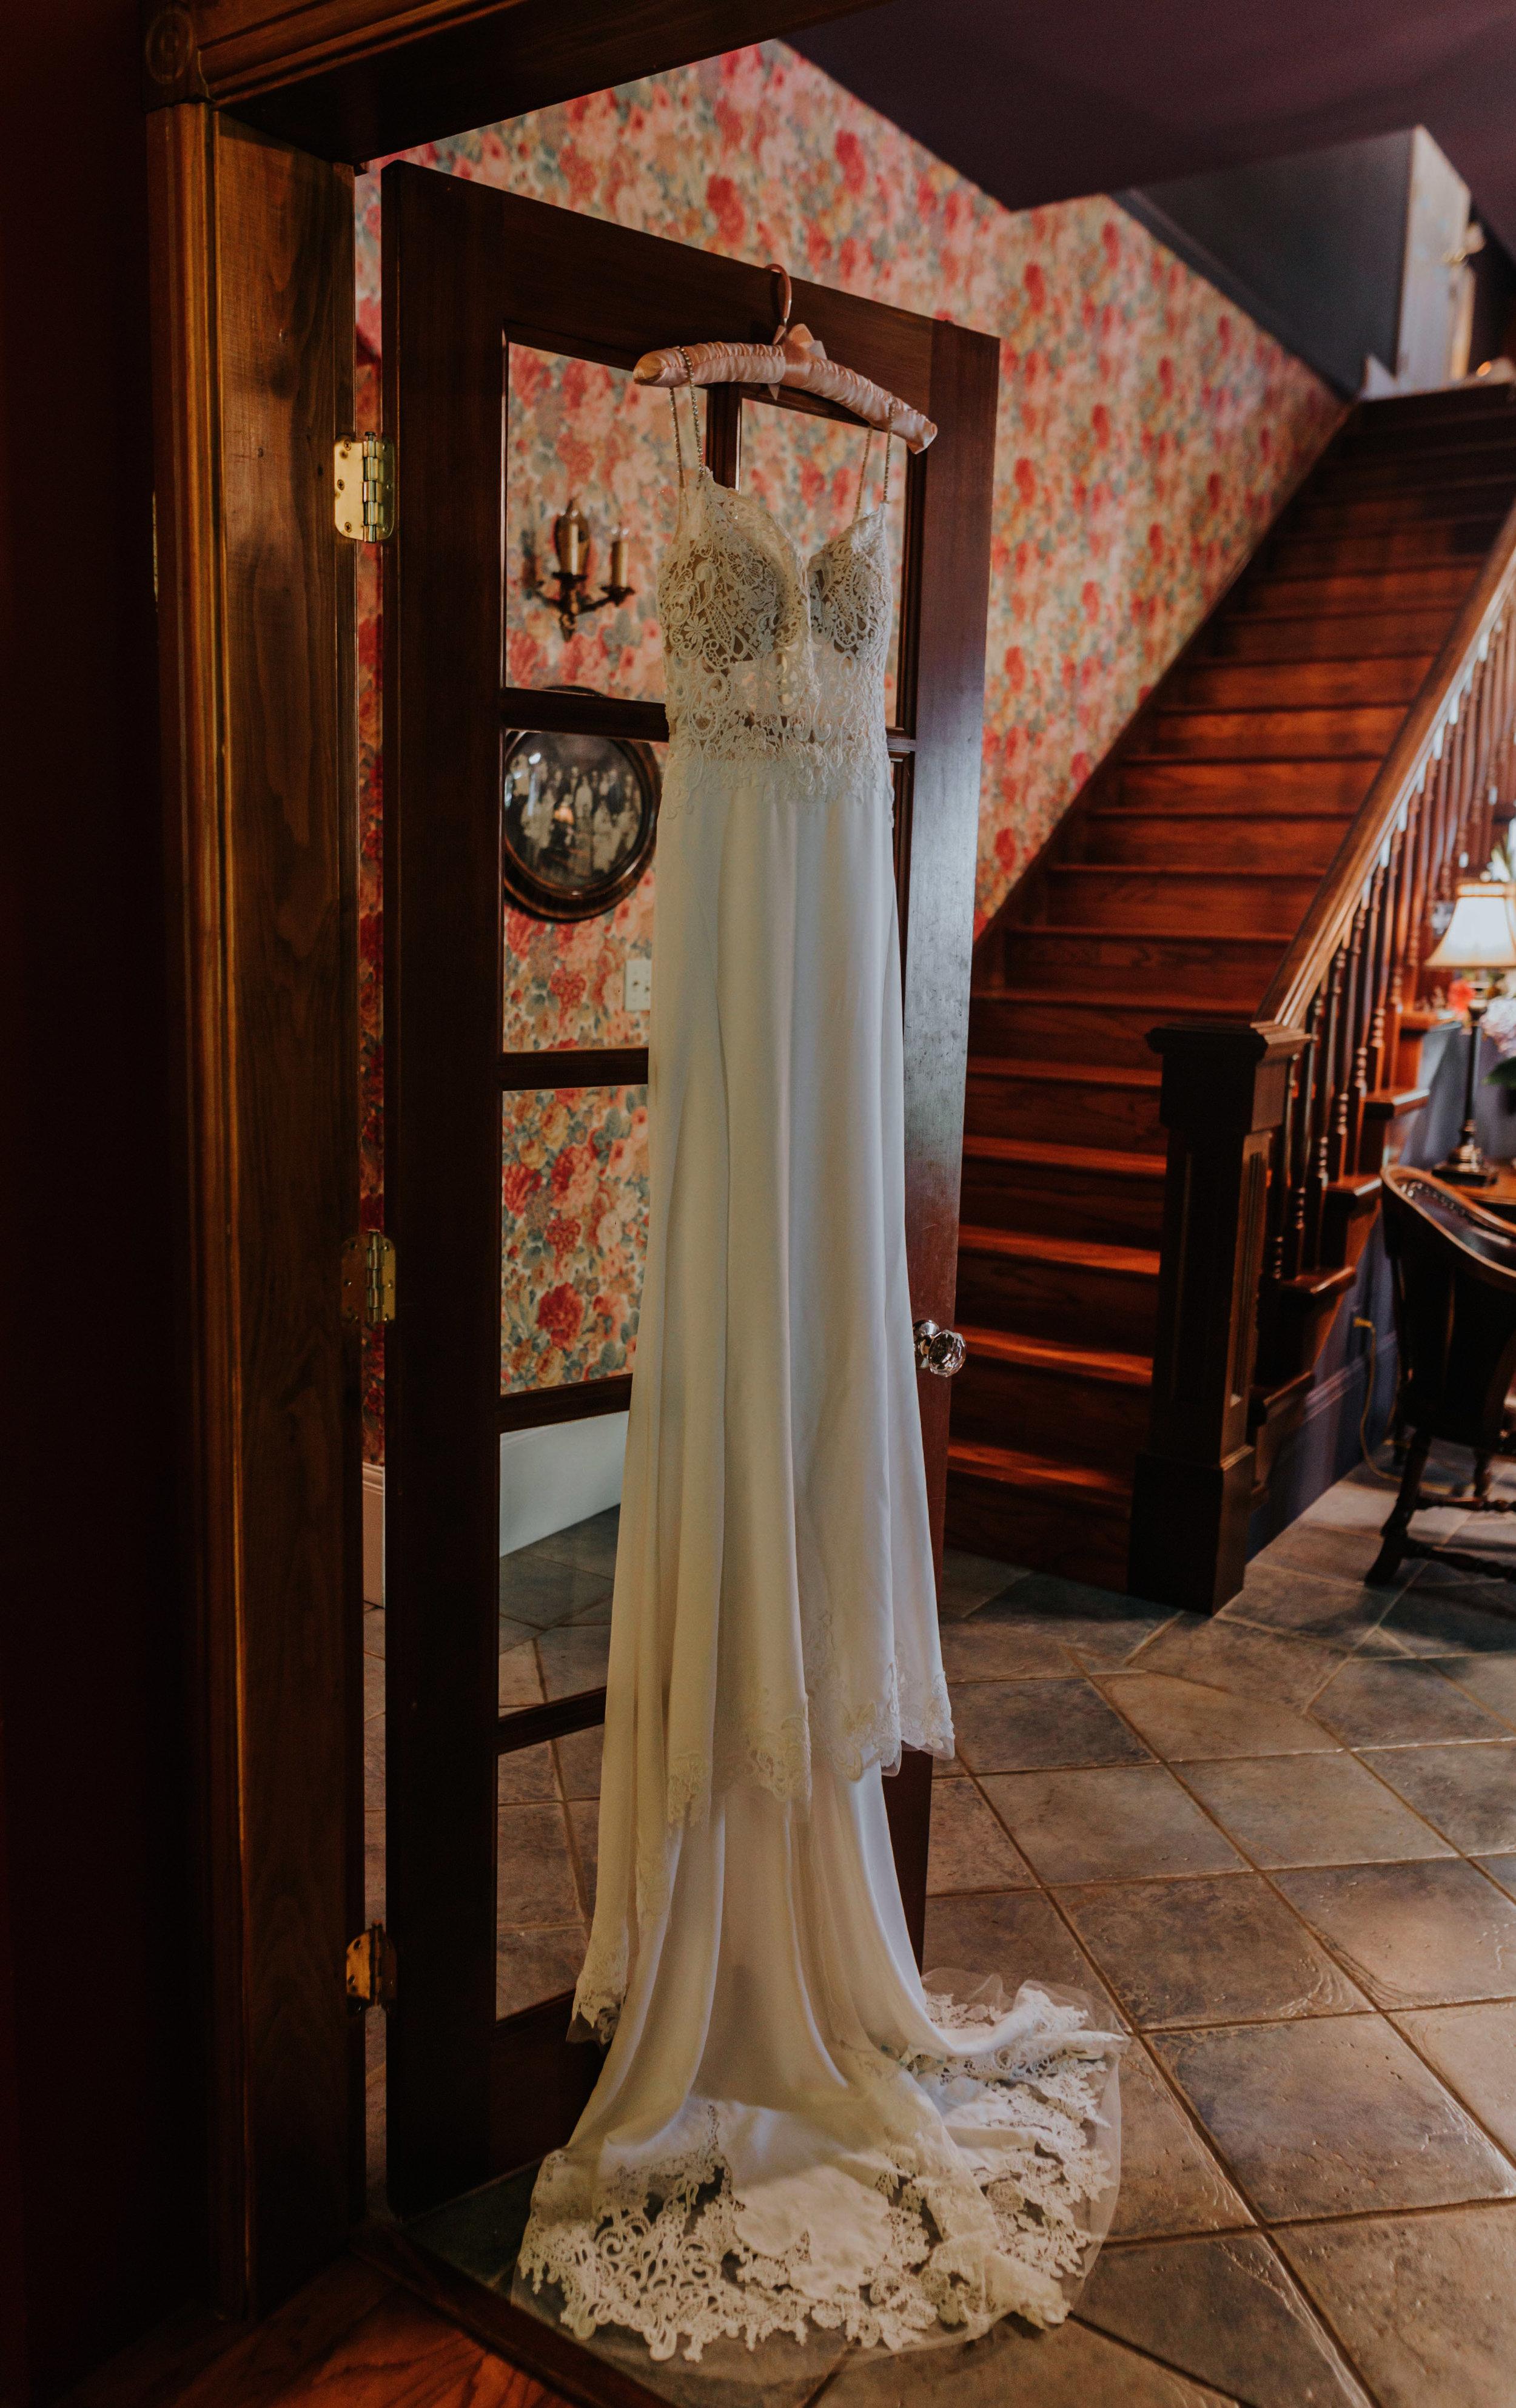 Linwood House Wedding Photos - Roberts Creek Wedding Photos - Vancouver Wedding Photographer & Videographer - Sunshine Coast Wedding Photos - Sunshine Coast Wedding Photographer - Jennifer Picard Photography - Vintage Wedding Venue